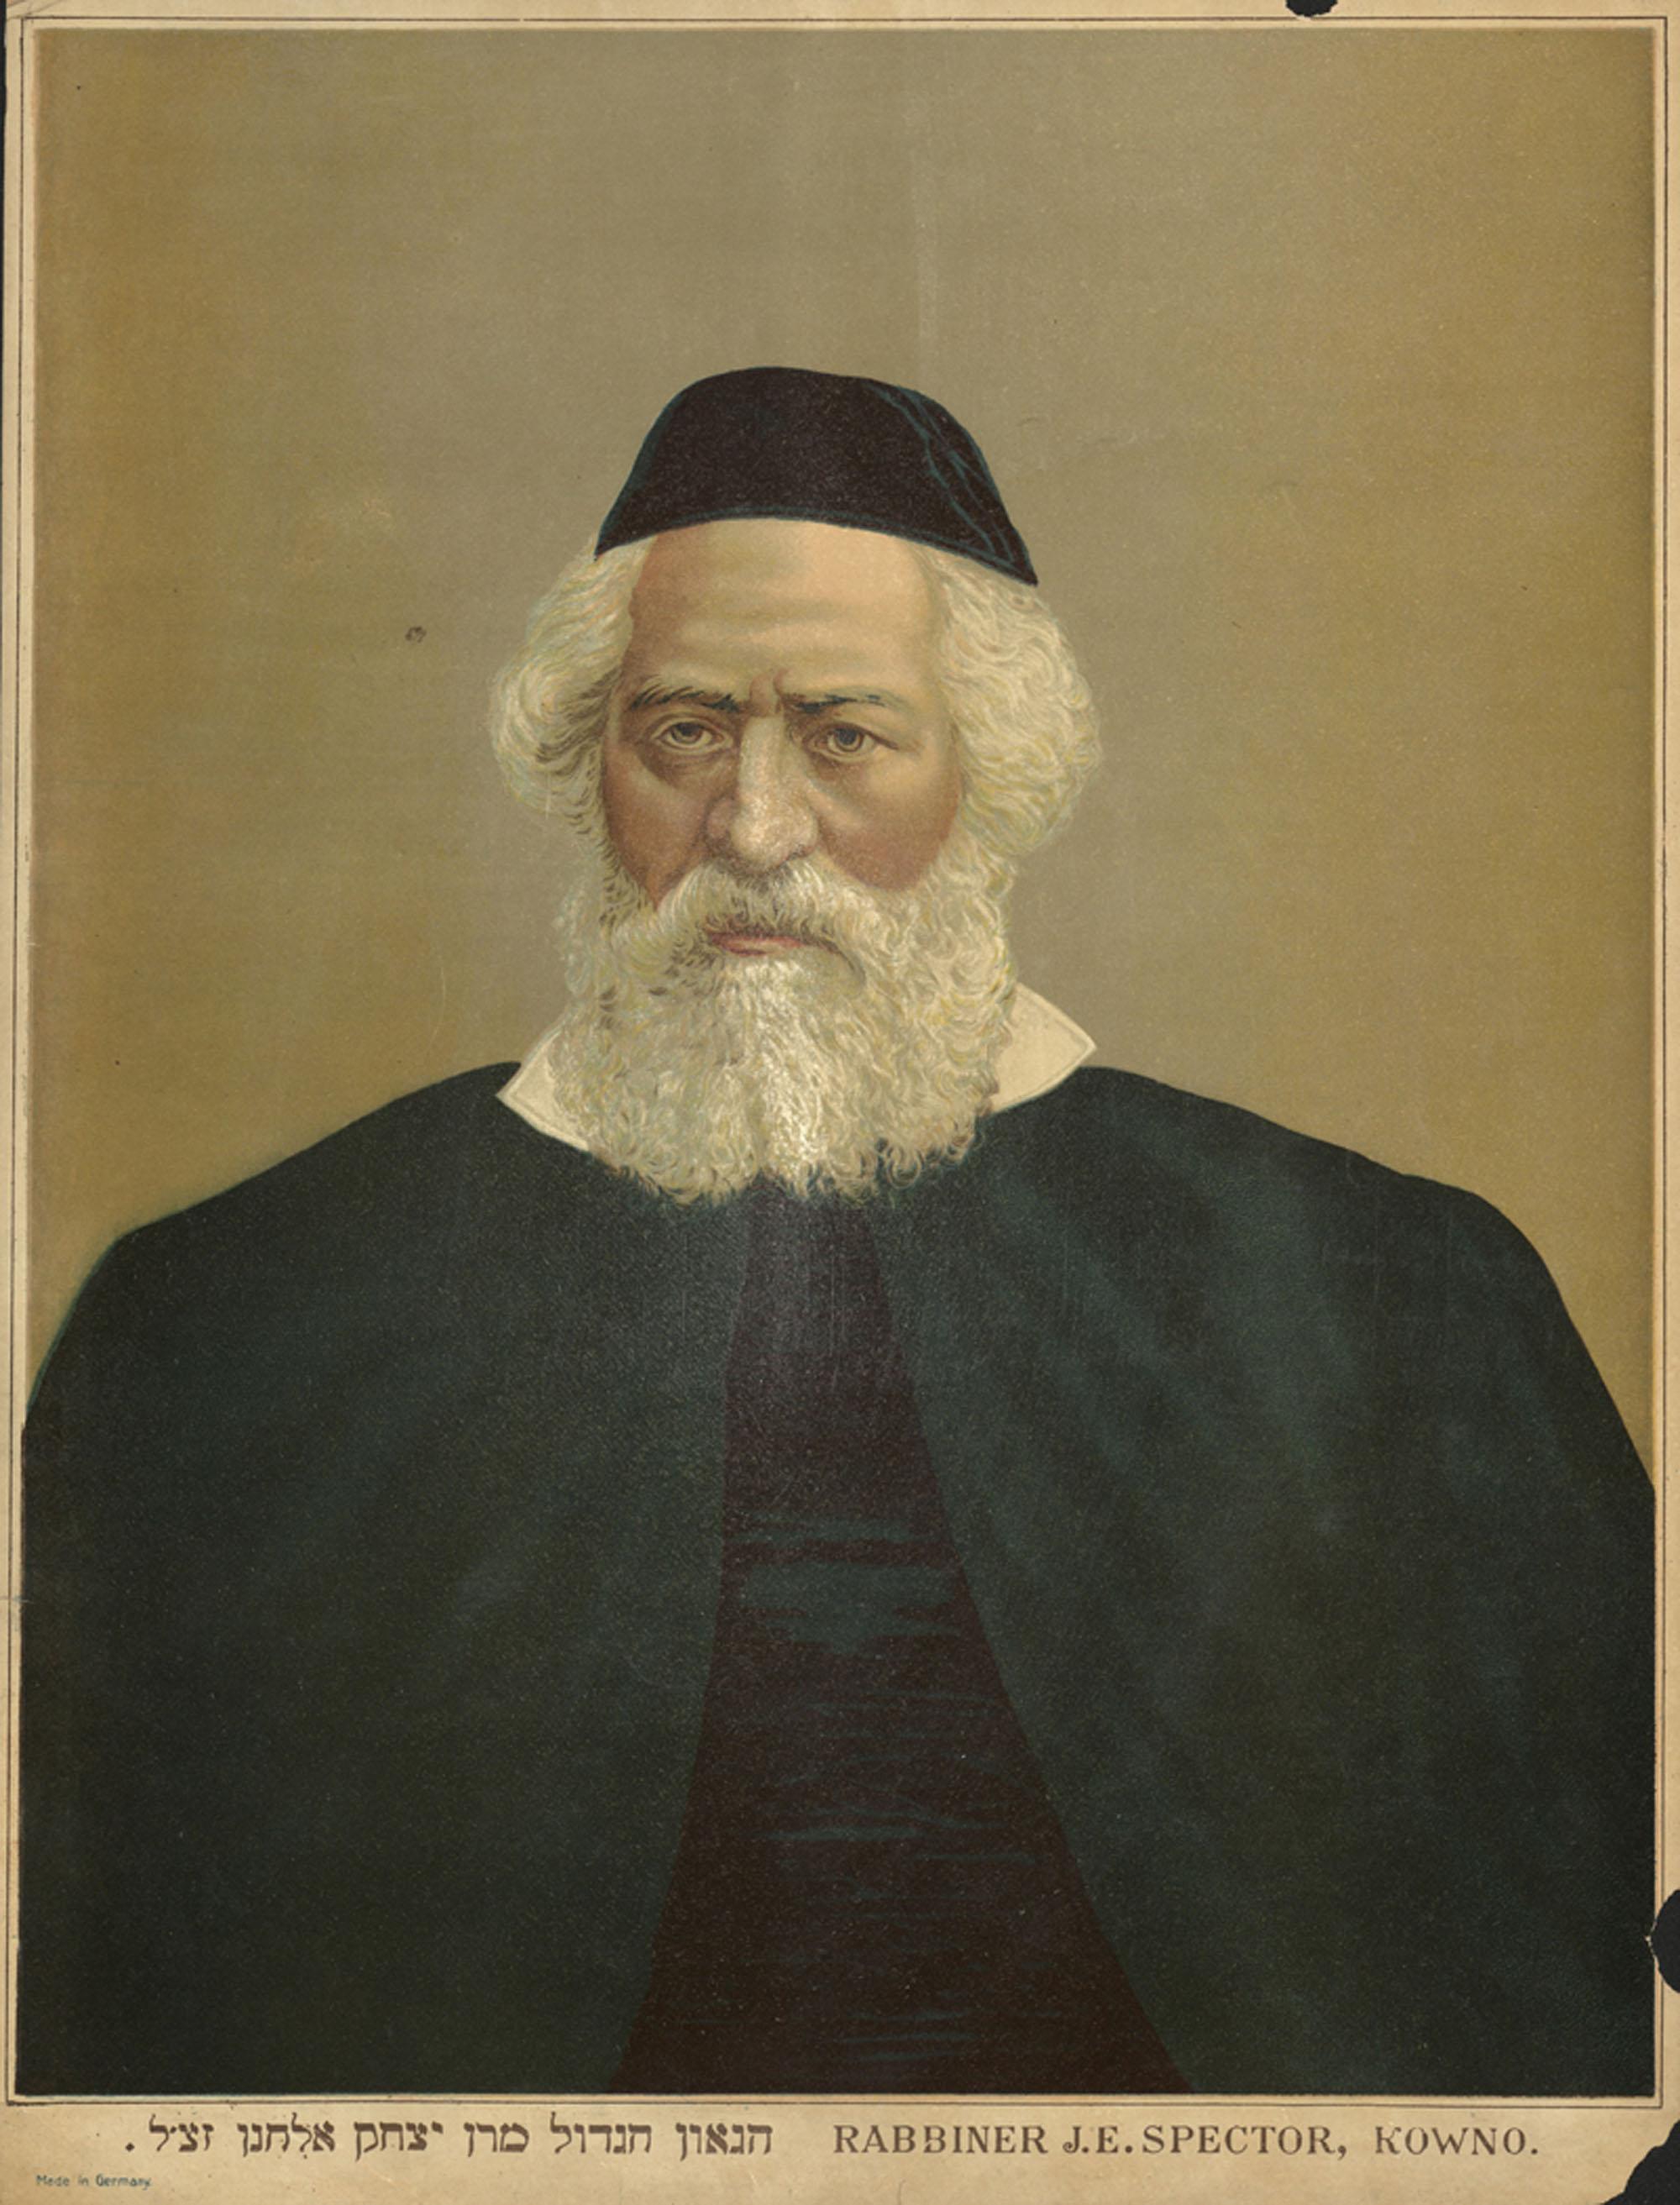 Rabbiner J. E. Spector, Kowno / הגאון הגדול מרן יצחק אלחנן זצ''ל